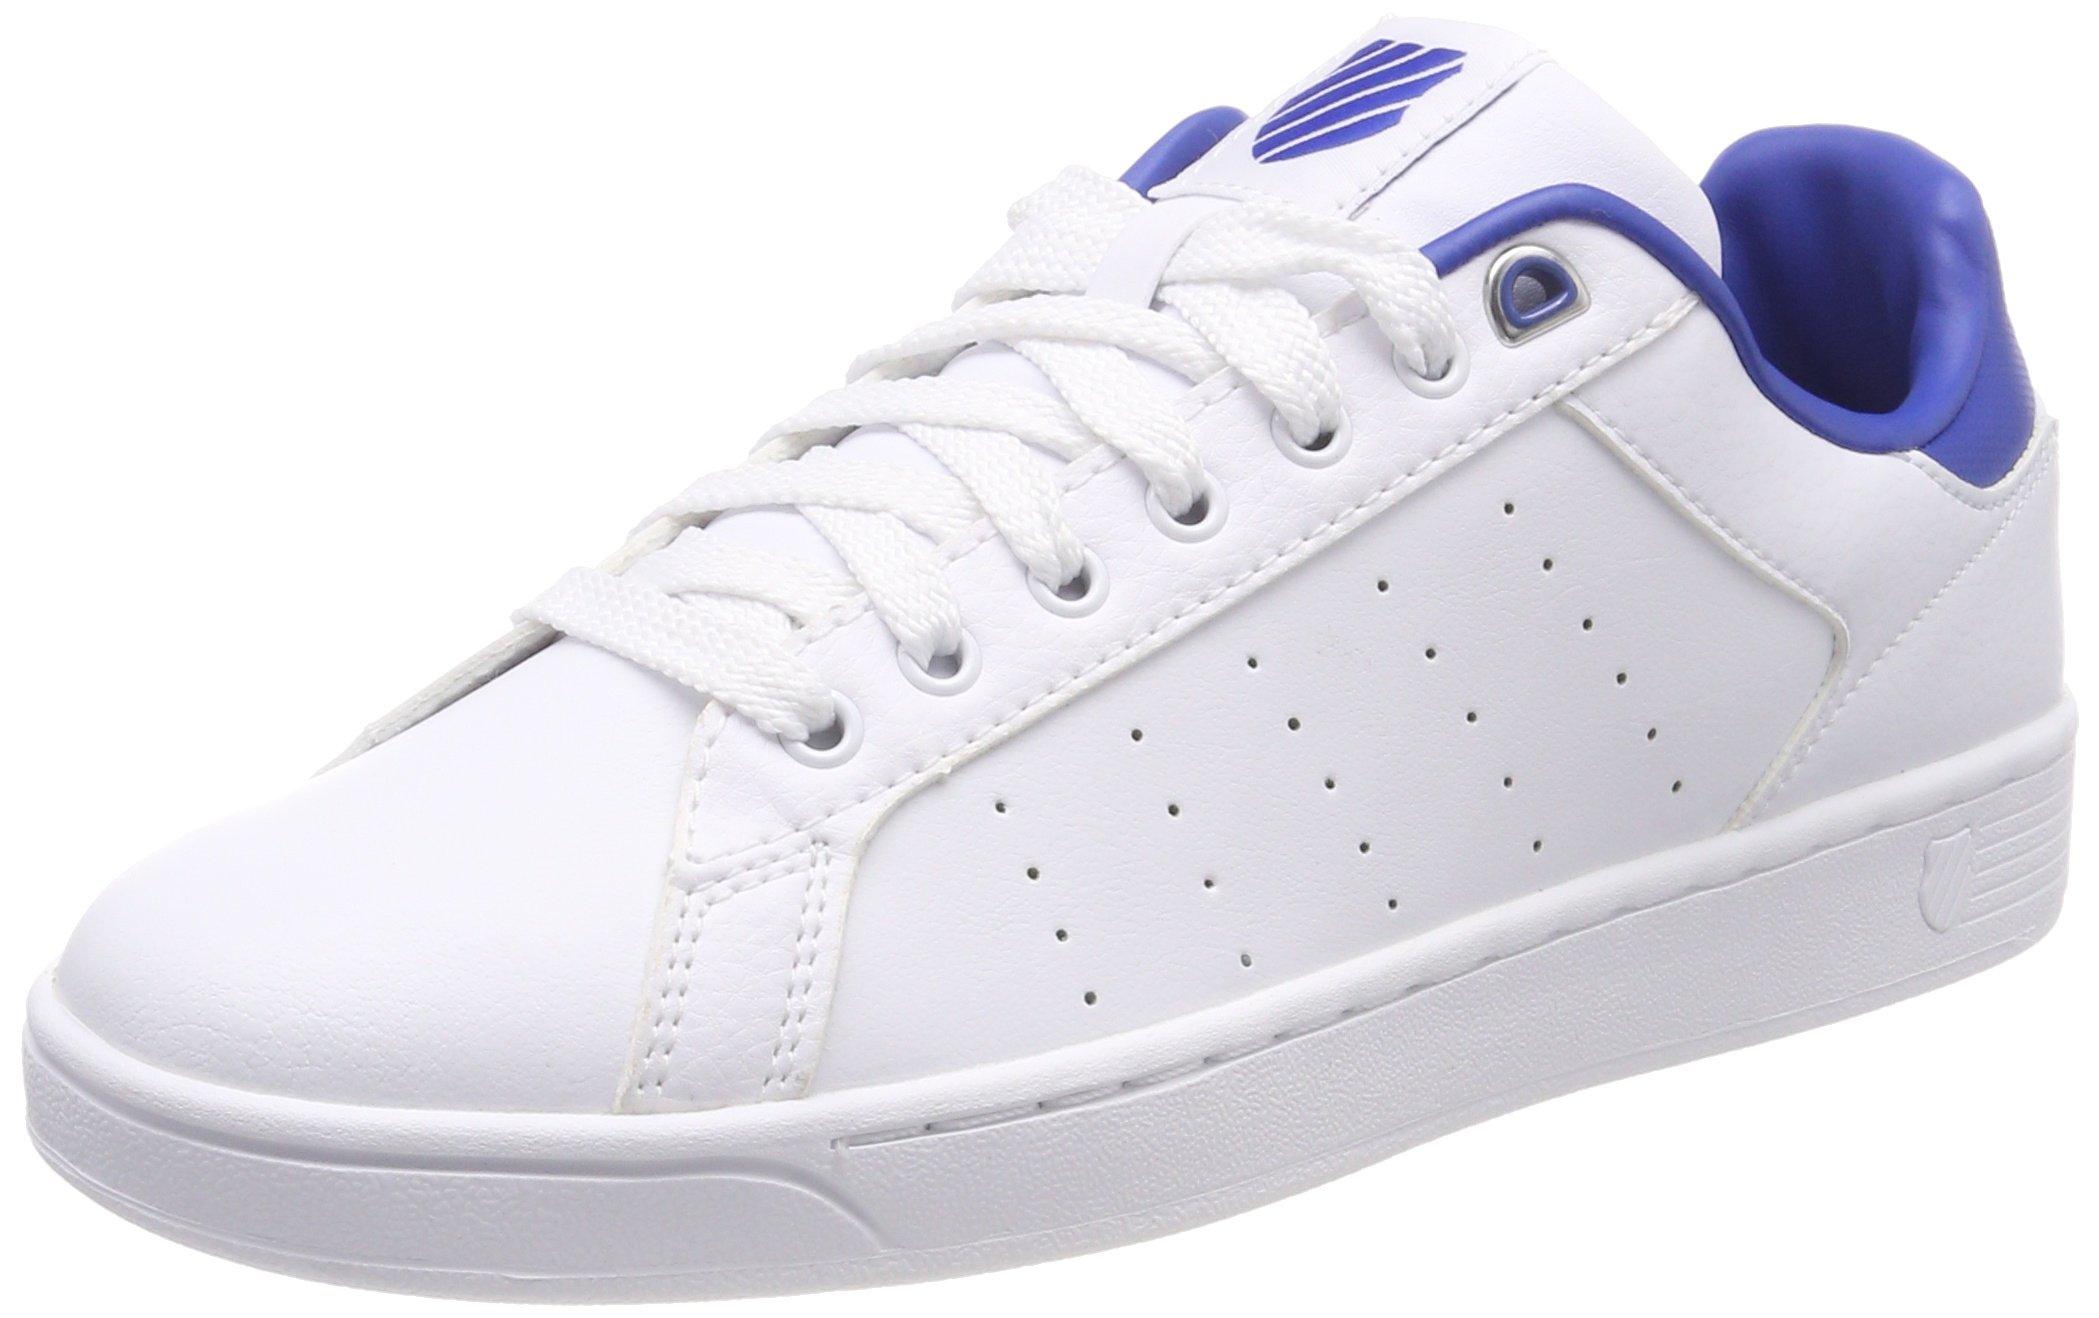 CmfSneakers Eu HommeBlanc Classic Clean white46 Basses Blue K swiss Court yOvwNm8n0